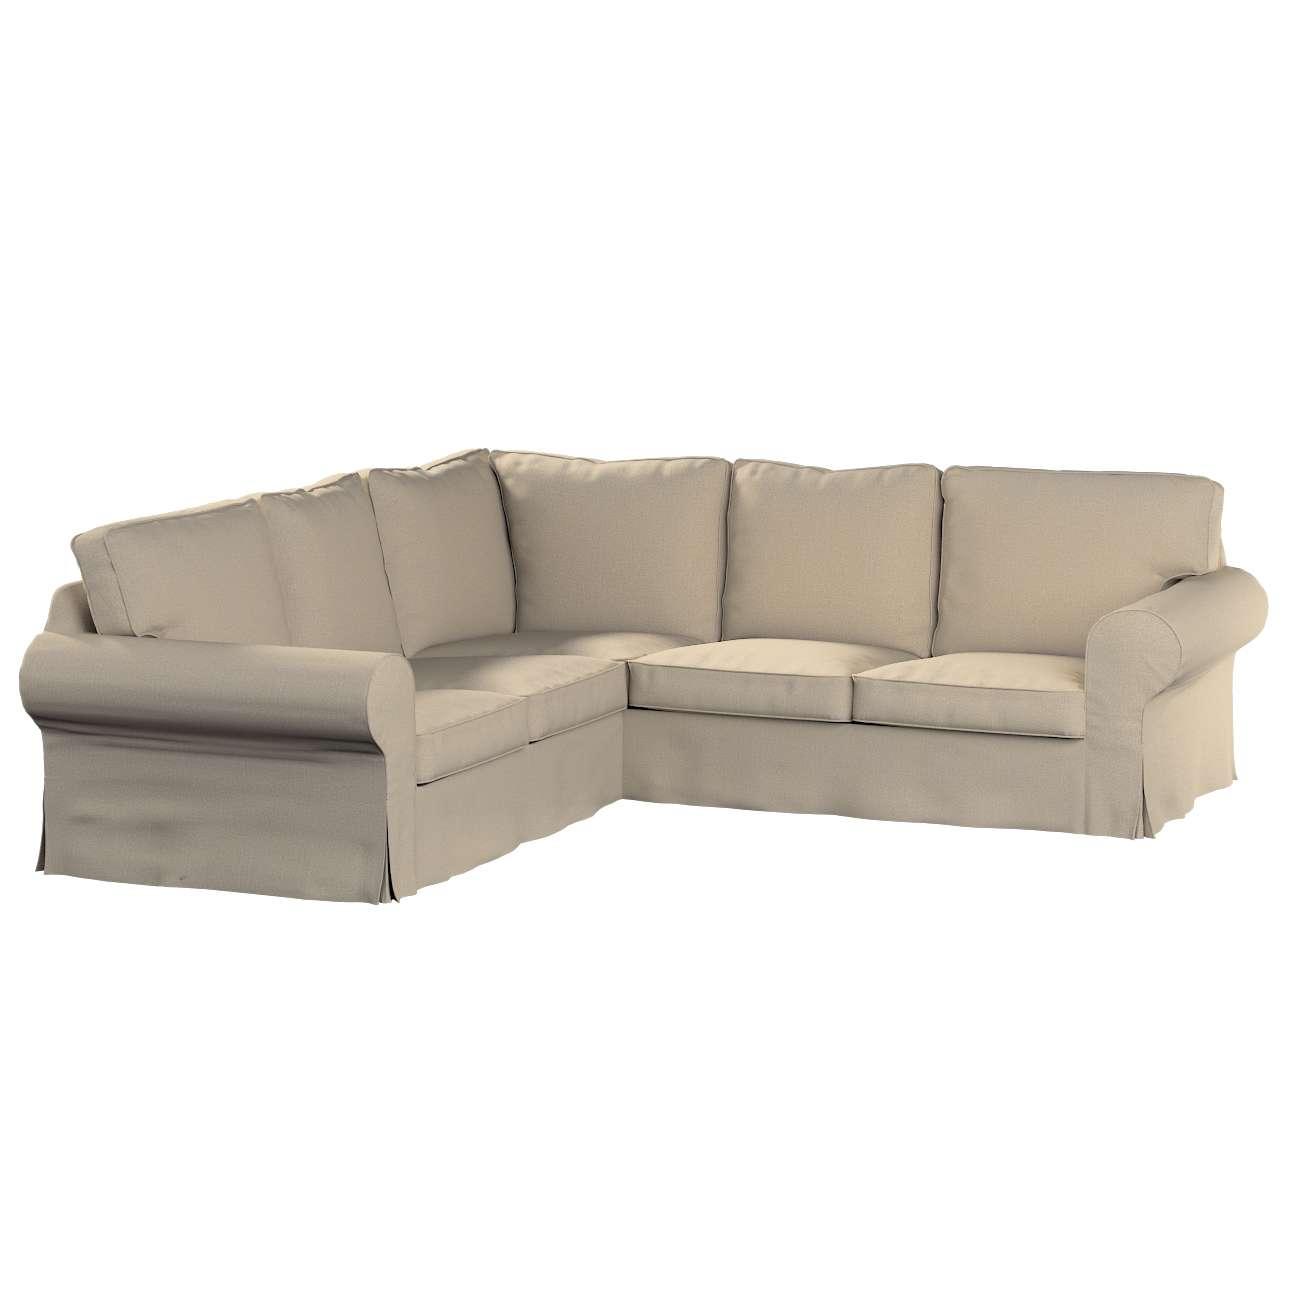 Ektorp kampinė sofa Ektorp kampinė sofa kolekcijoje Edinburgh , audinys: 115-78